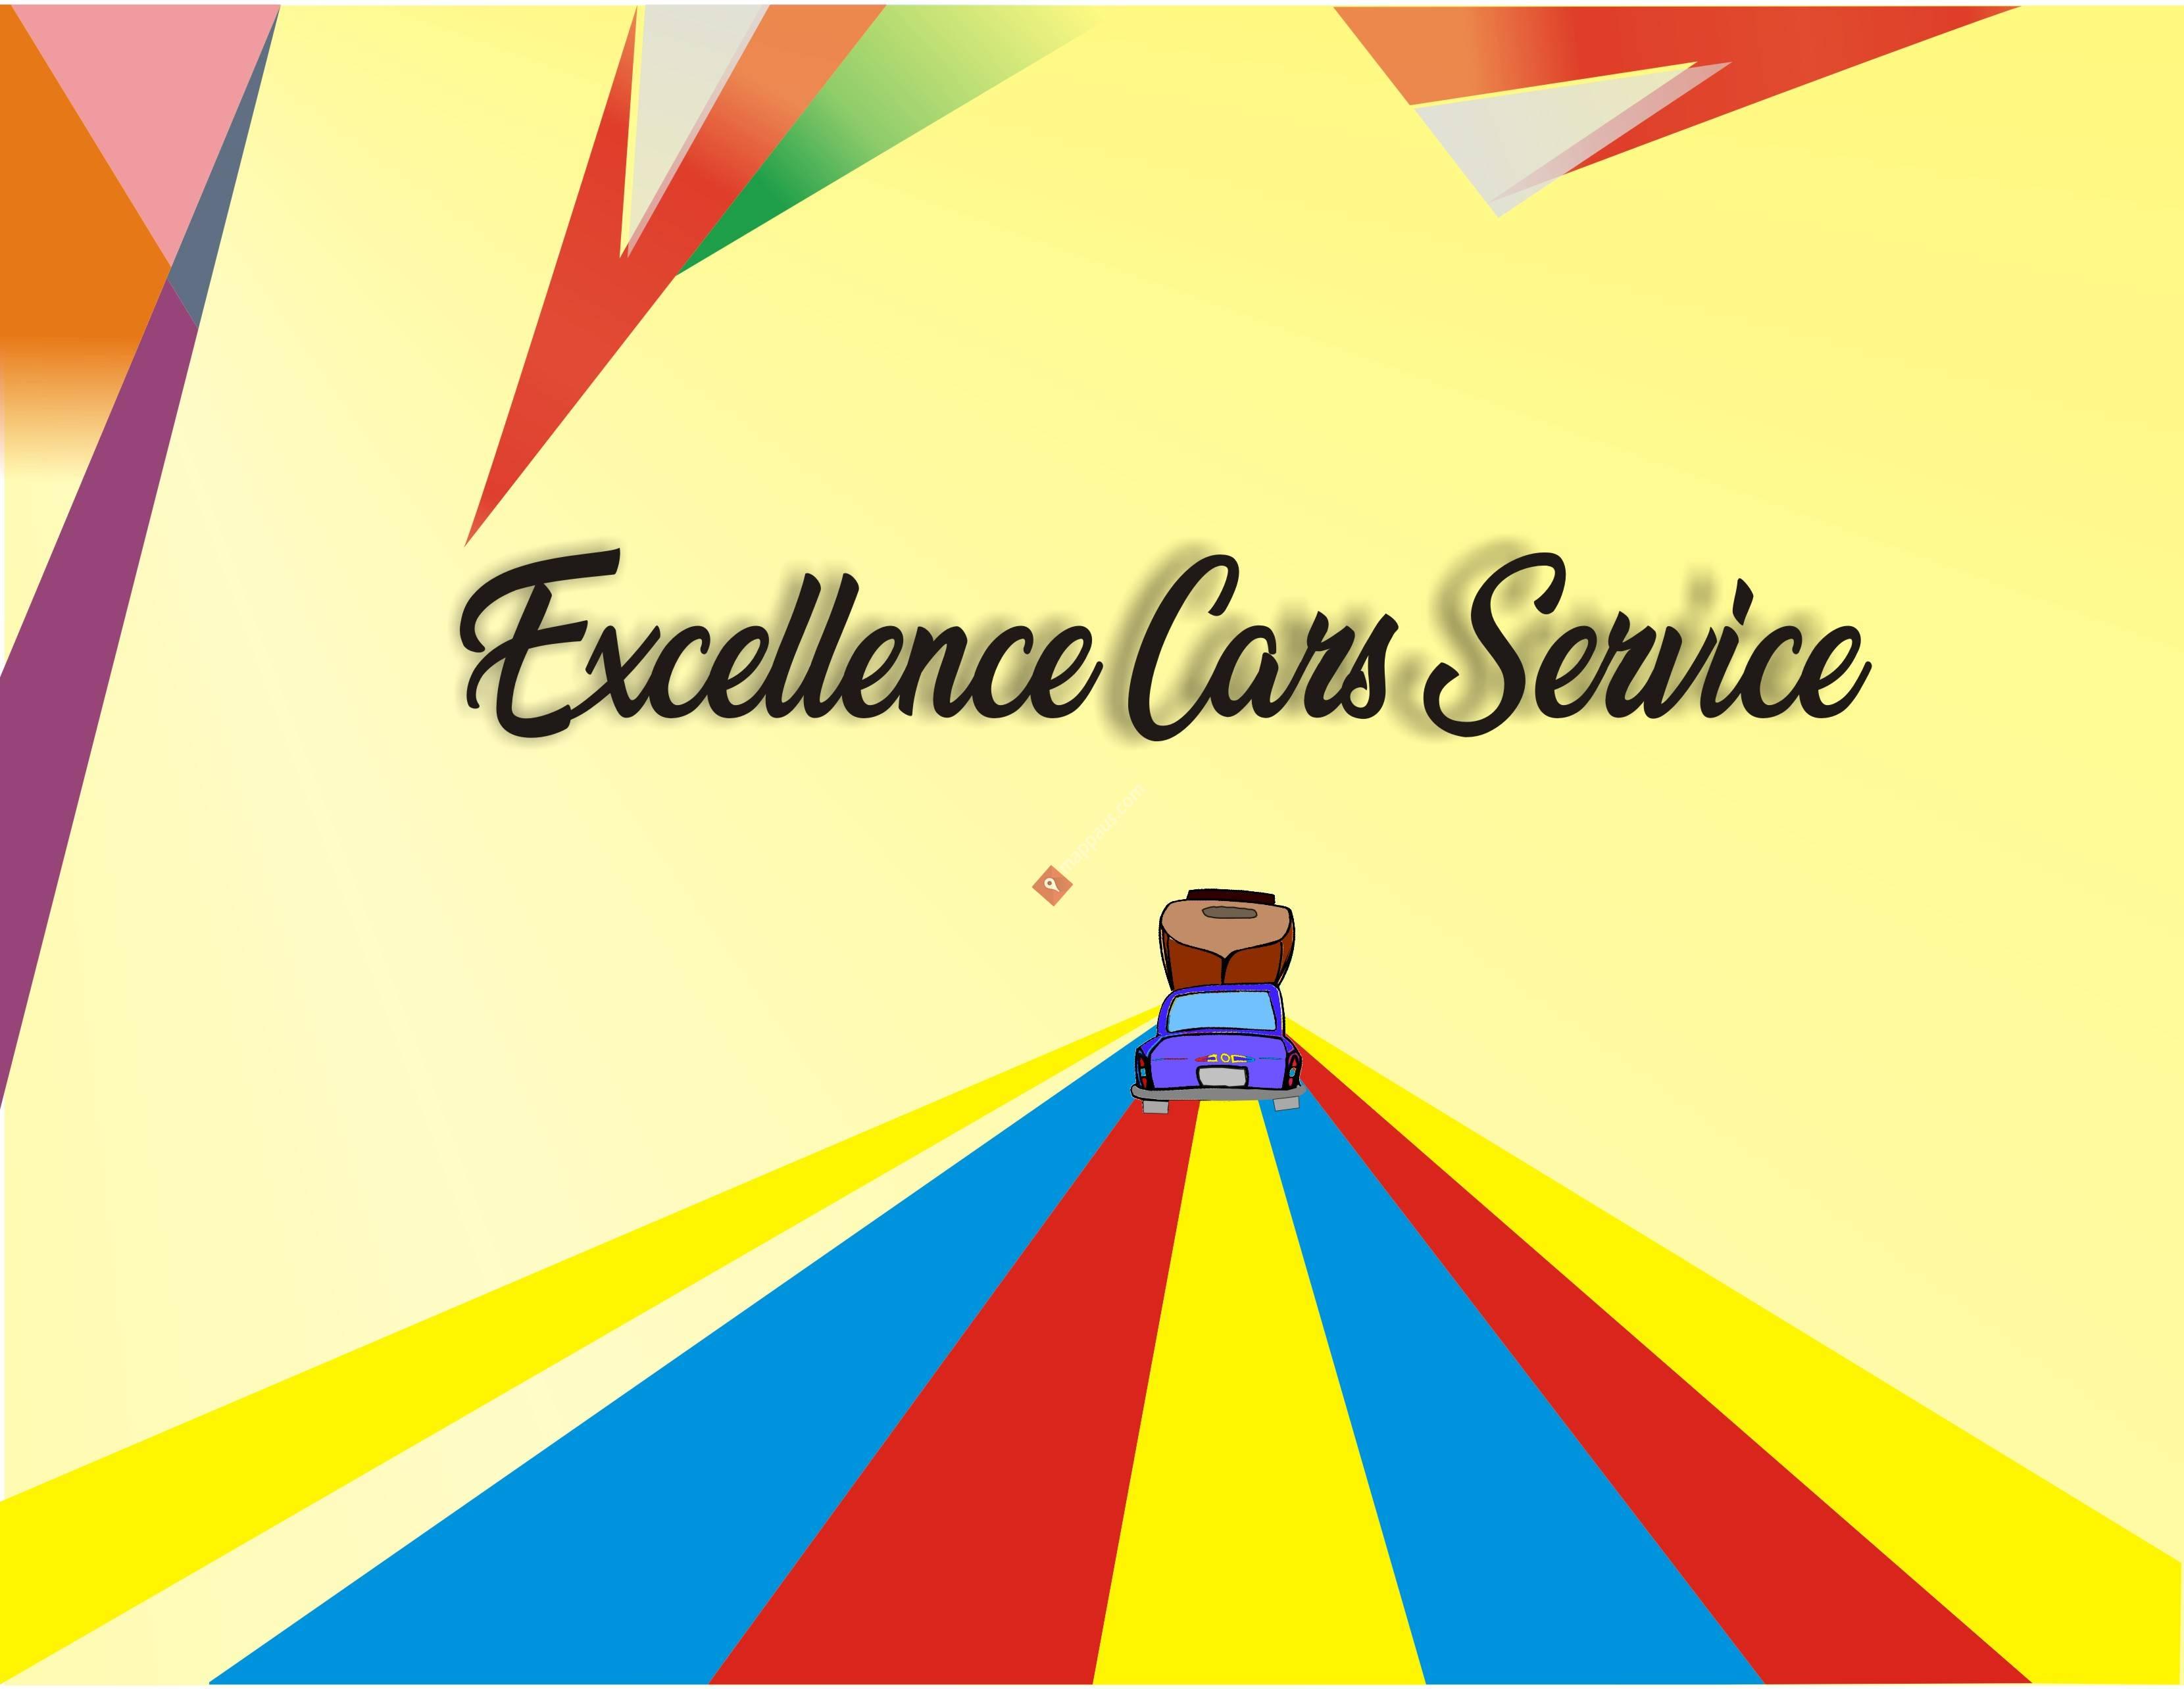 Excellence Cars - Luxury Car Hire Melbourne Chauffeur